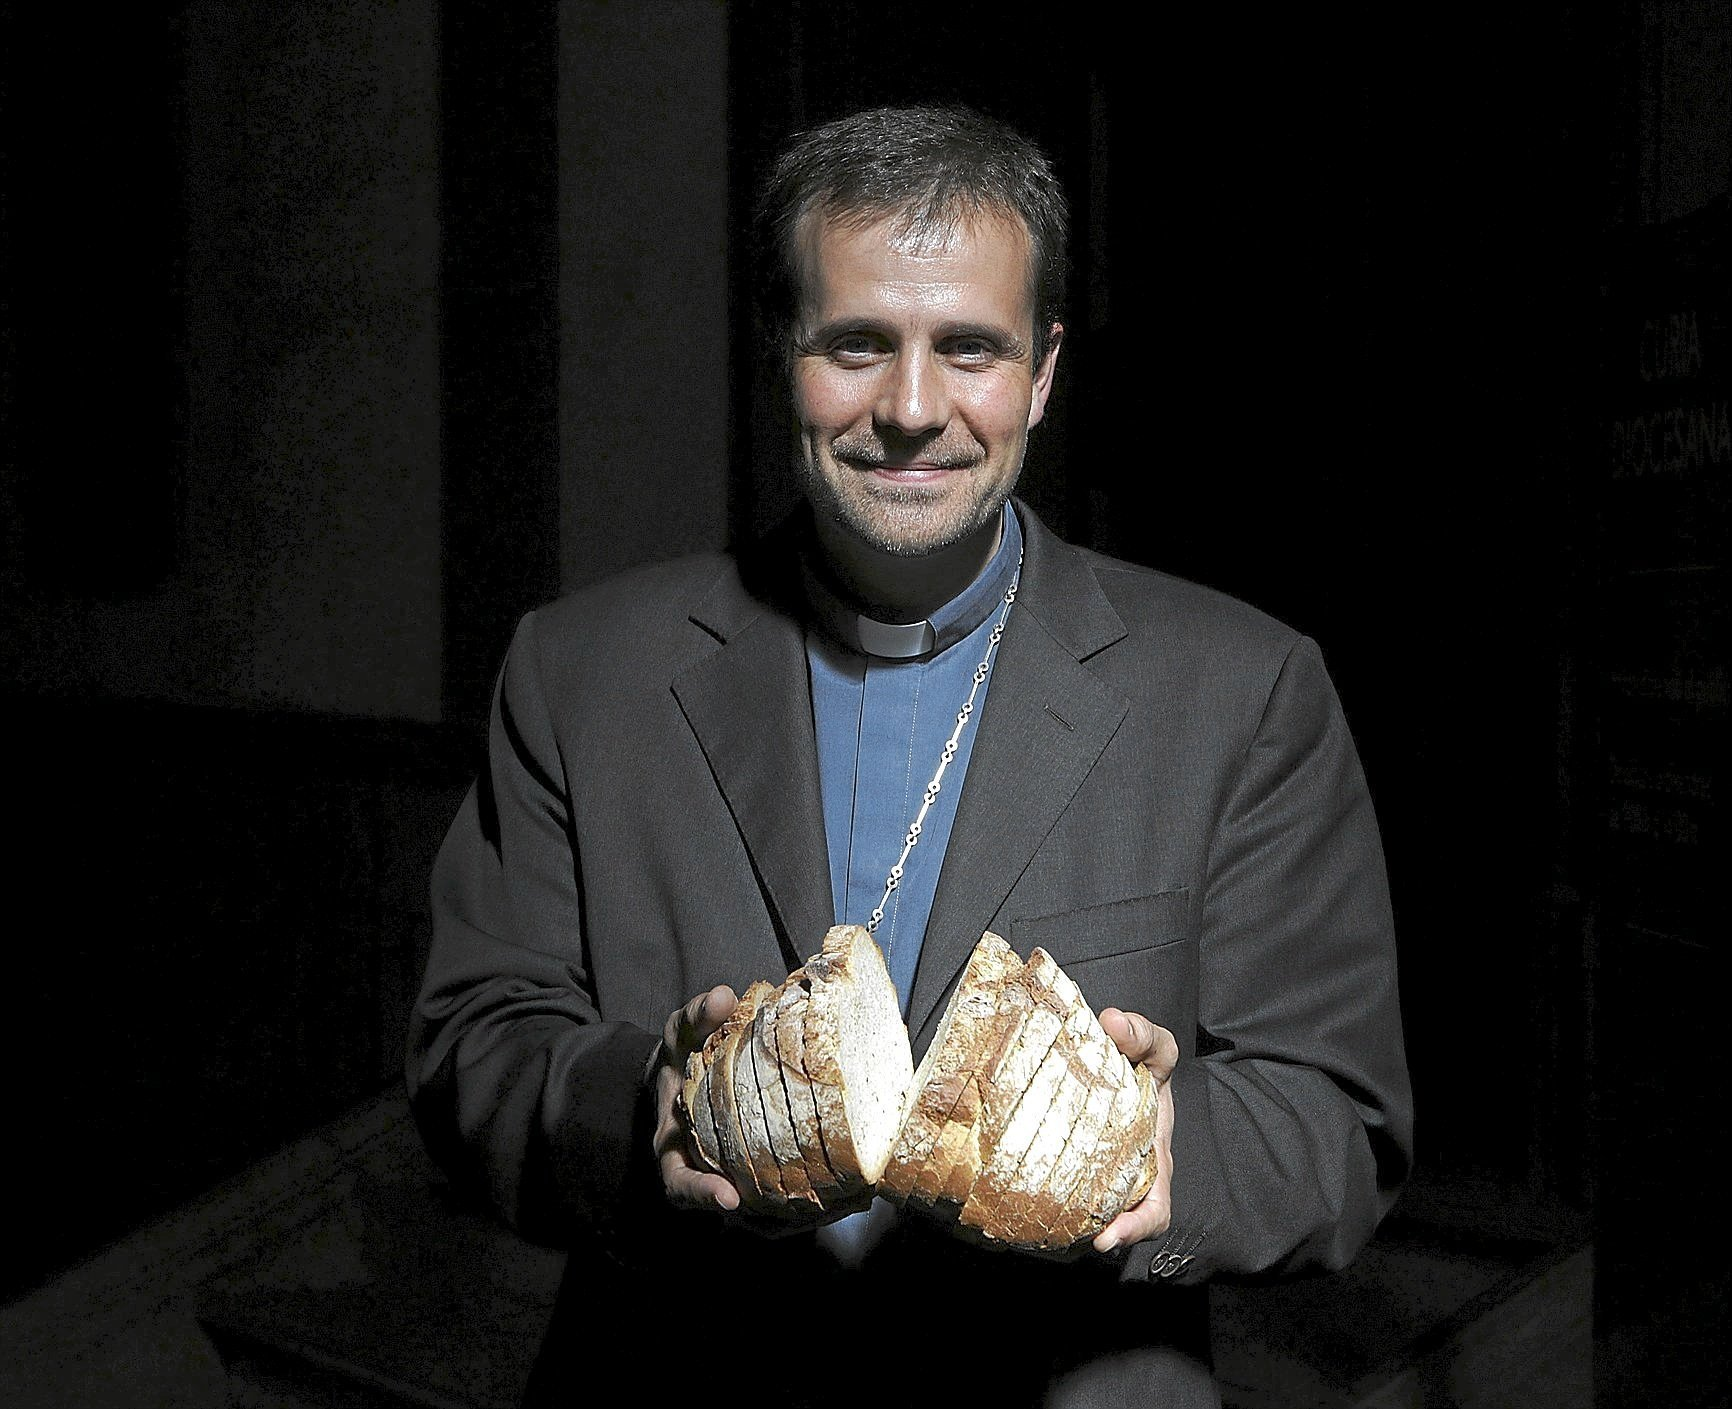 Xavier Novell, ex obispo de Solsona, en julio de 2011.